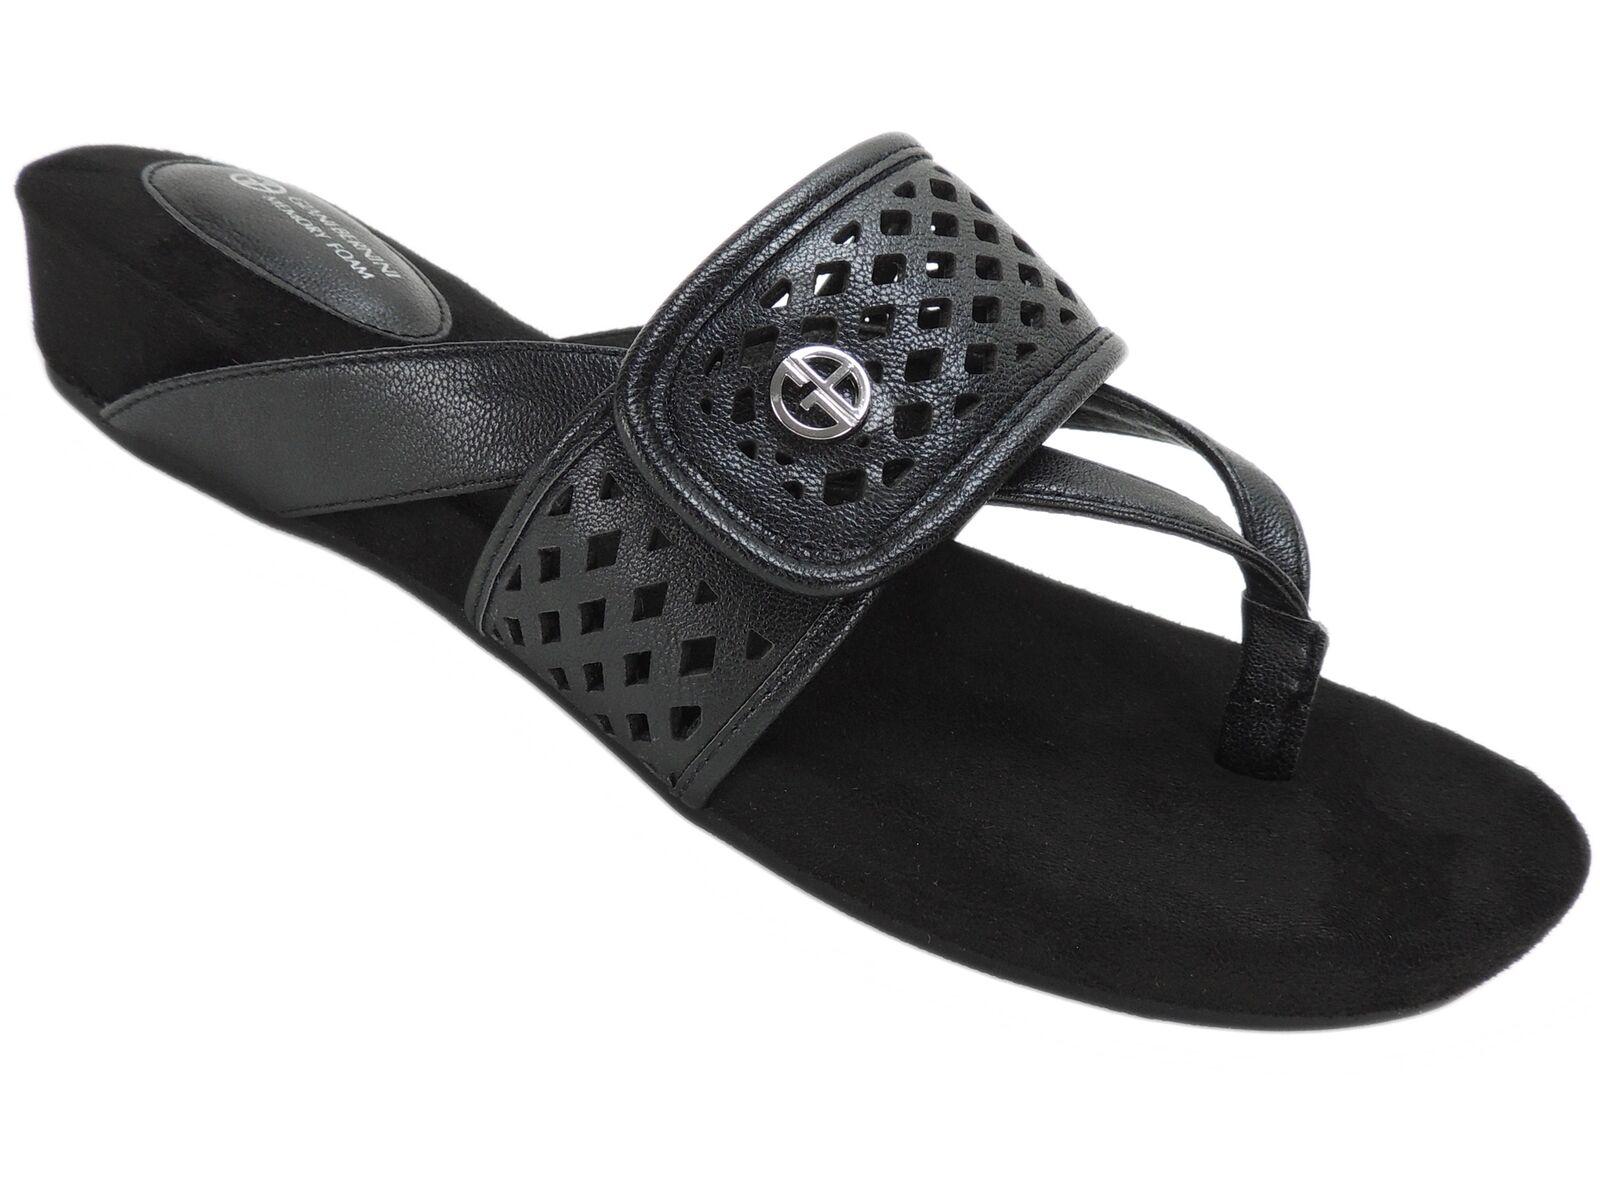 Giani Bernini Women's Releigh Casual Thong Slide Sandals Black Size 9.5 M